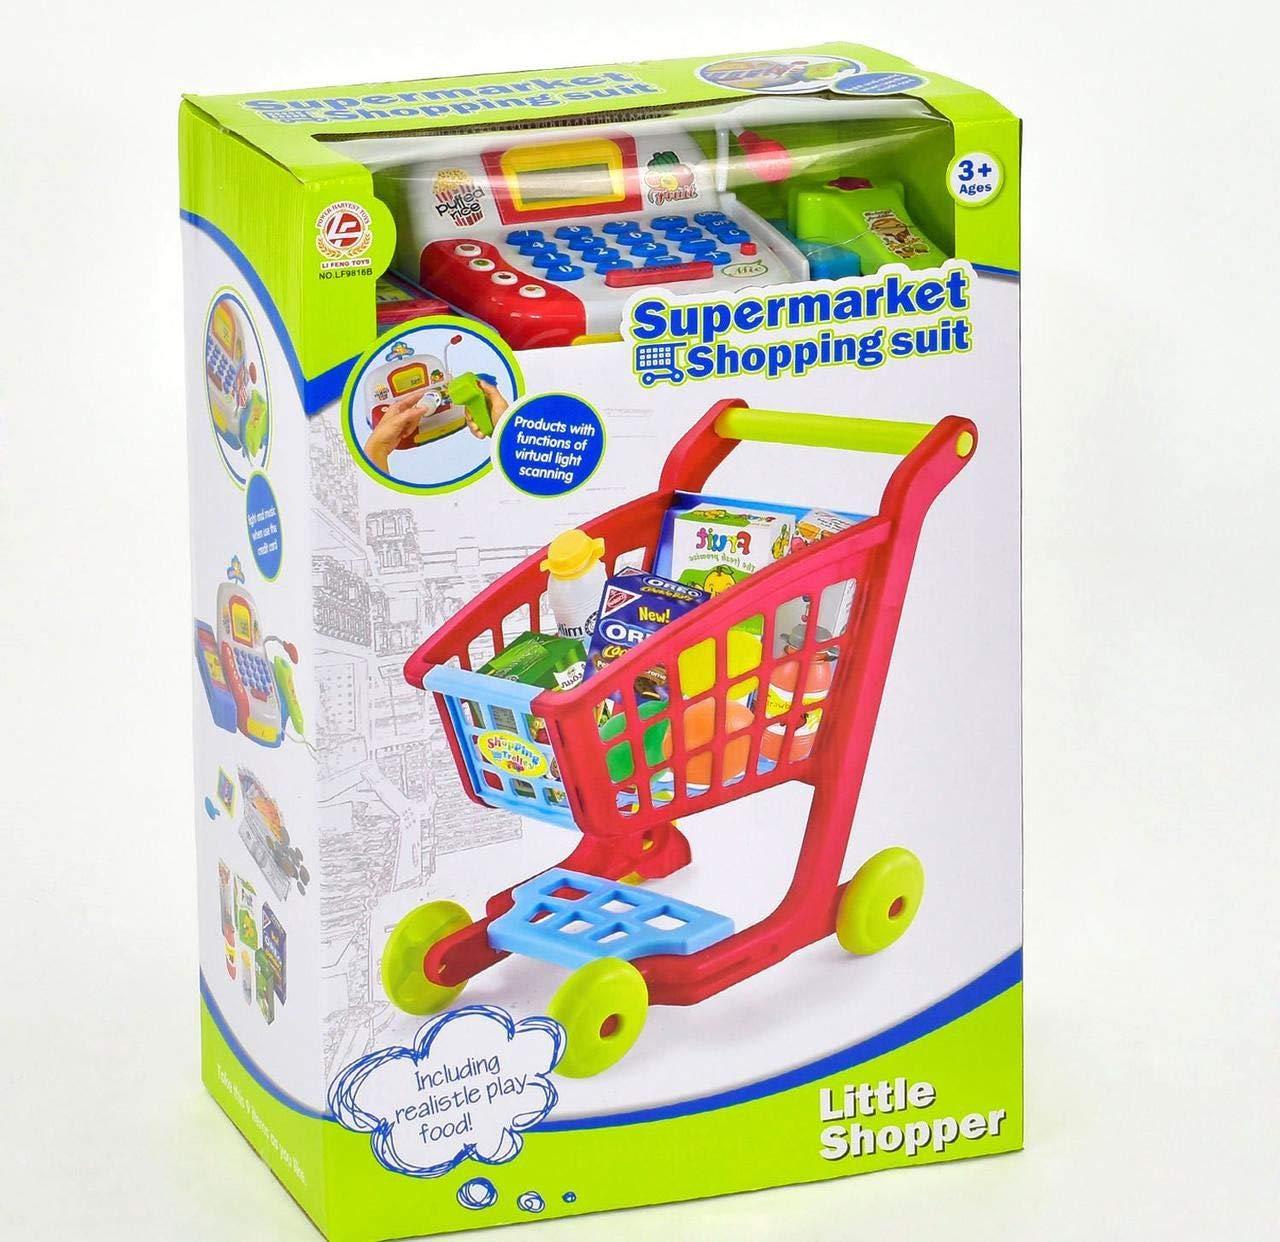 LI PENG TOYS Supermarket Shopping Suit Cash Register Shopping Cart & Groceries Pretend Play +3